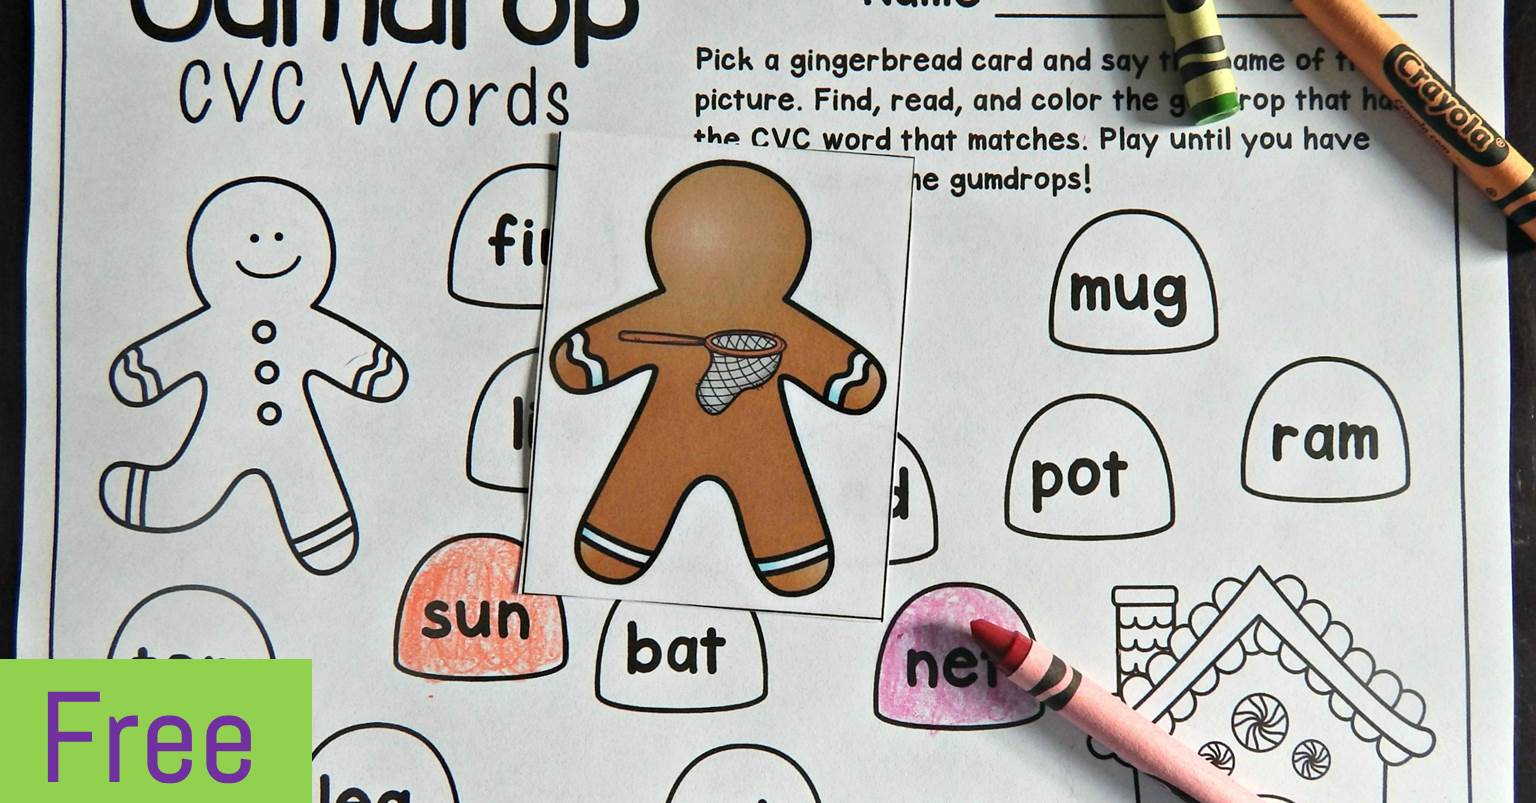 Free Gingerbread Cvc Game